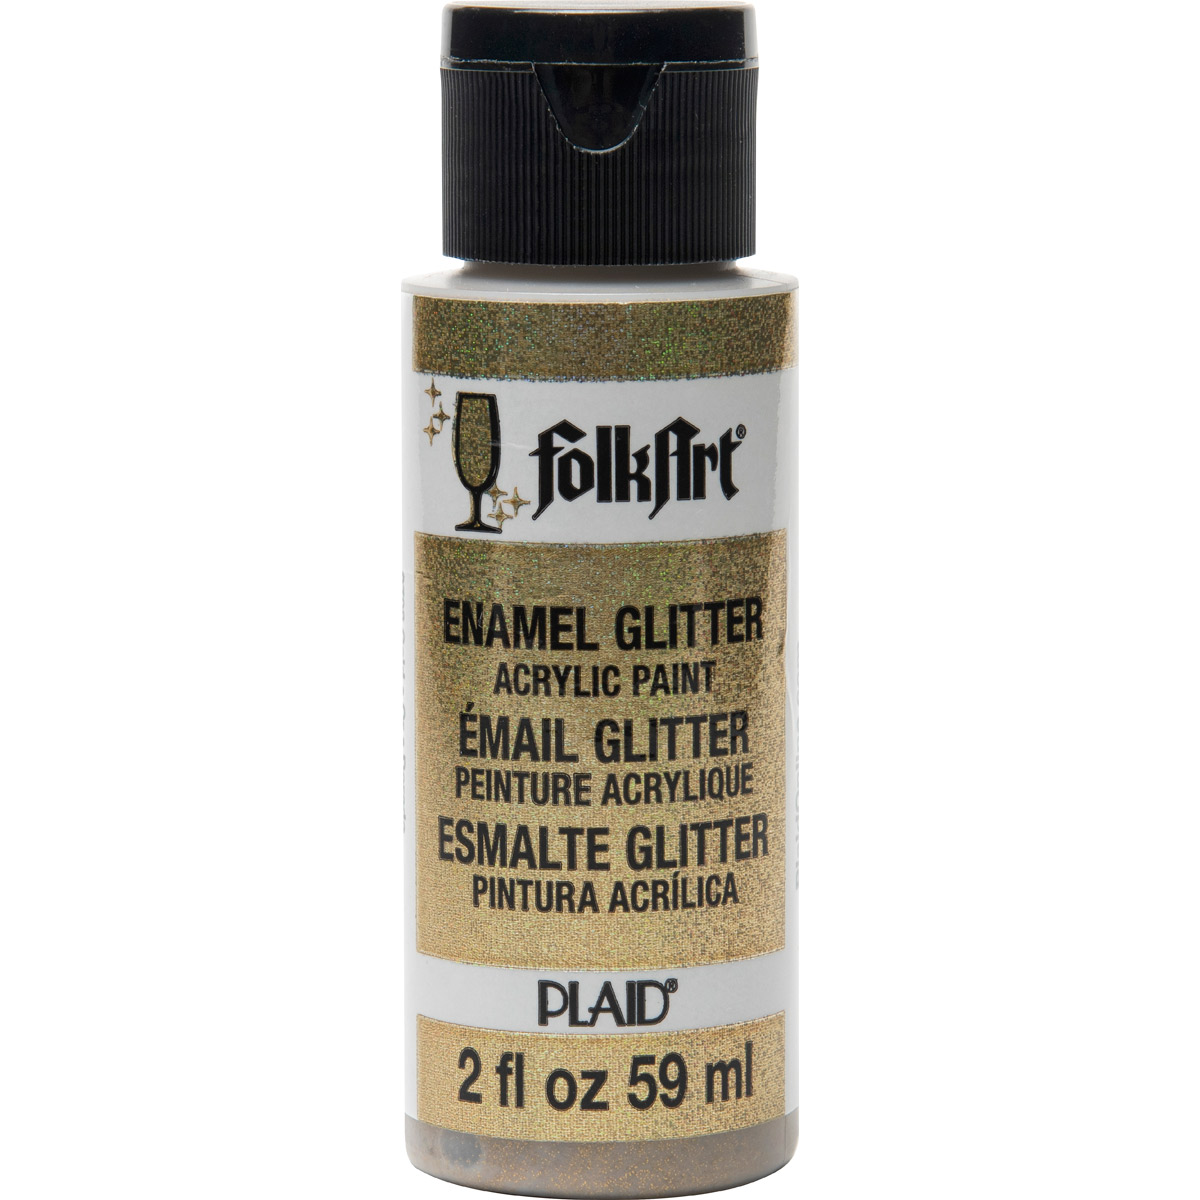 FolkArt ® Enamels™ - Glitter Gold, 2 oz.